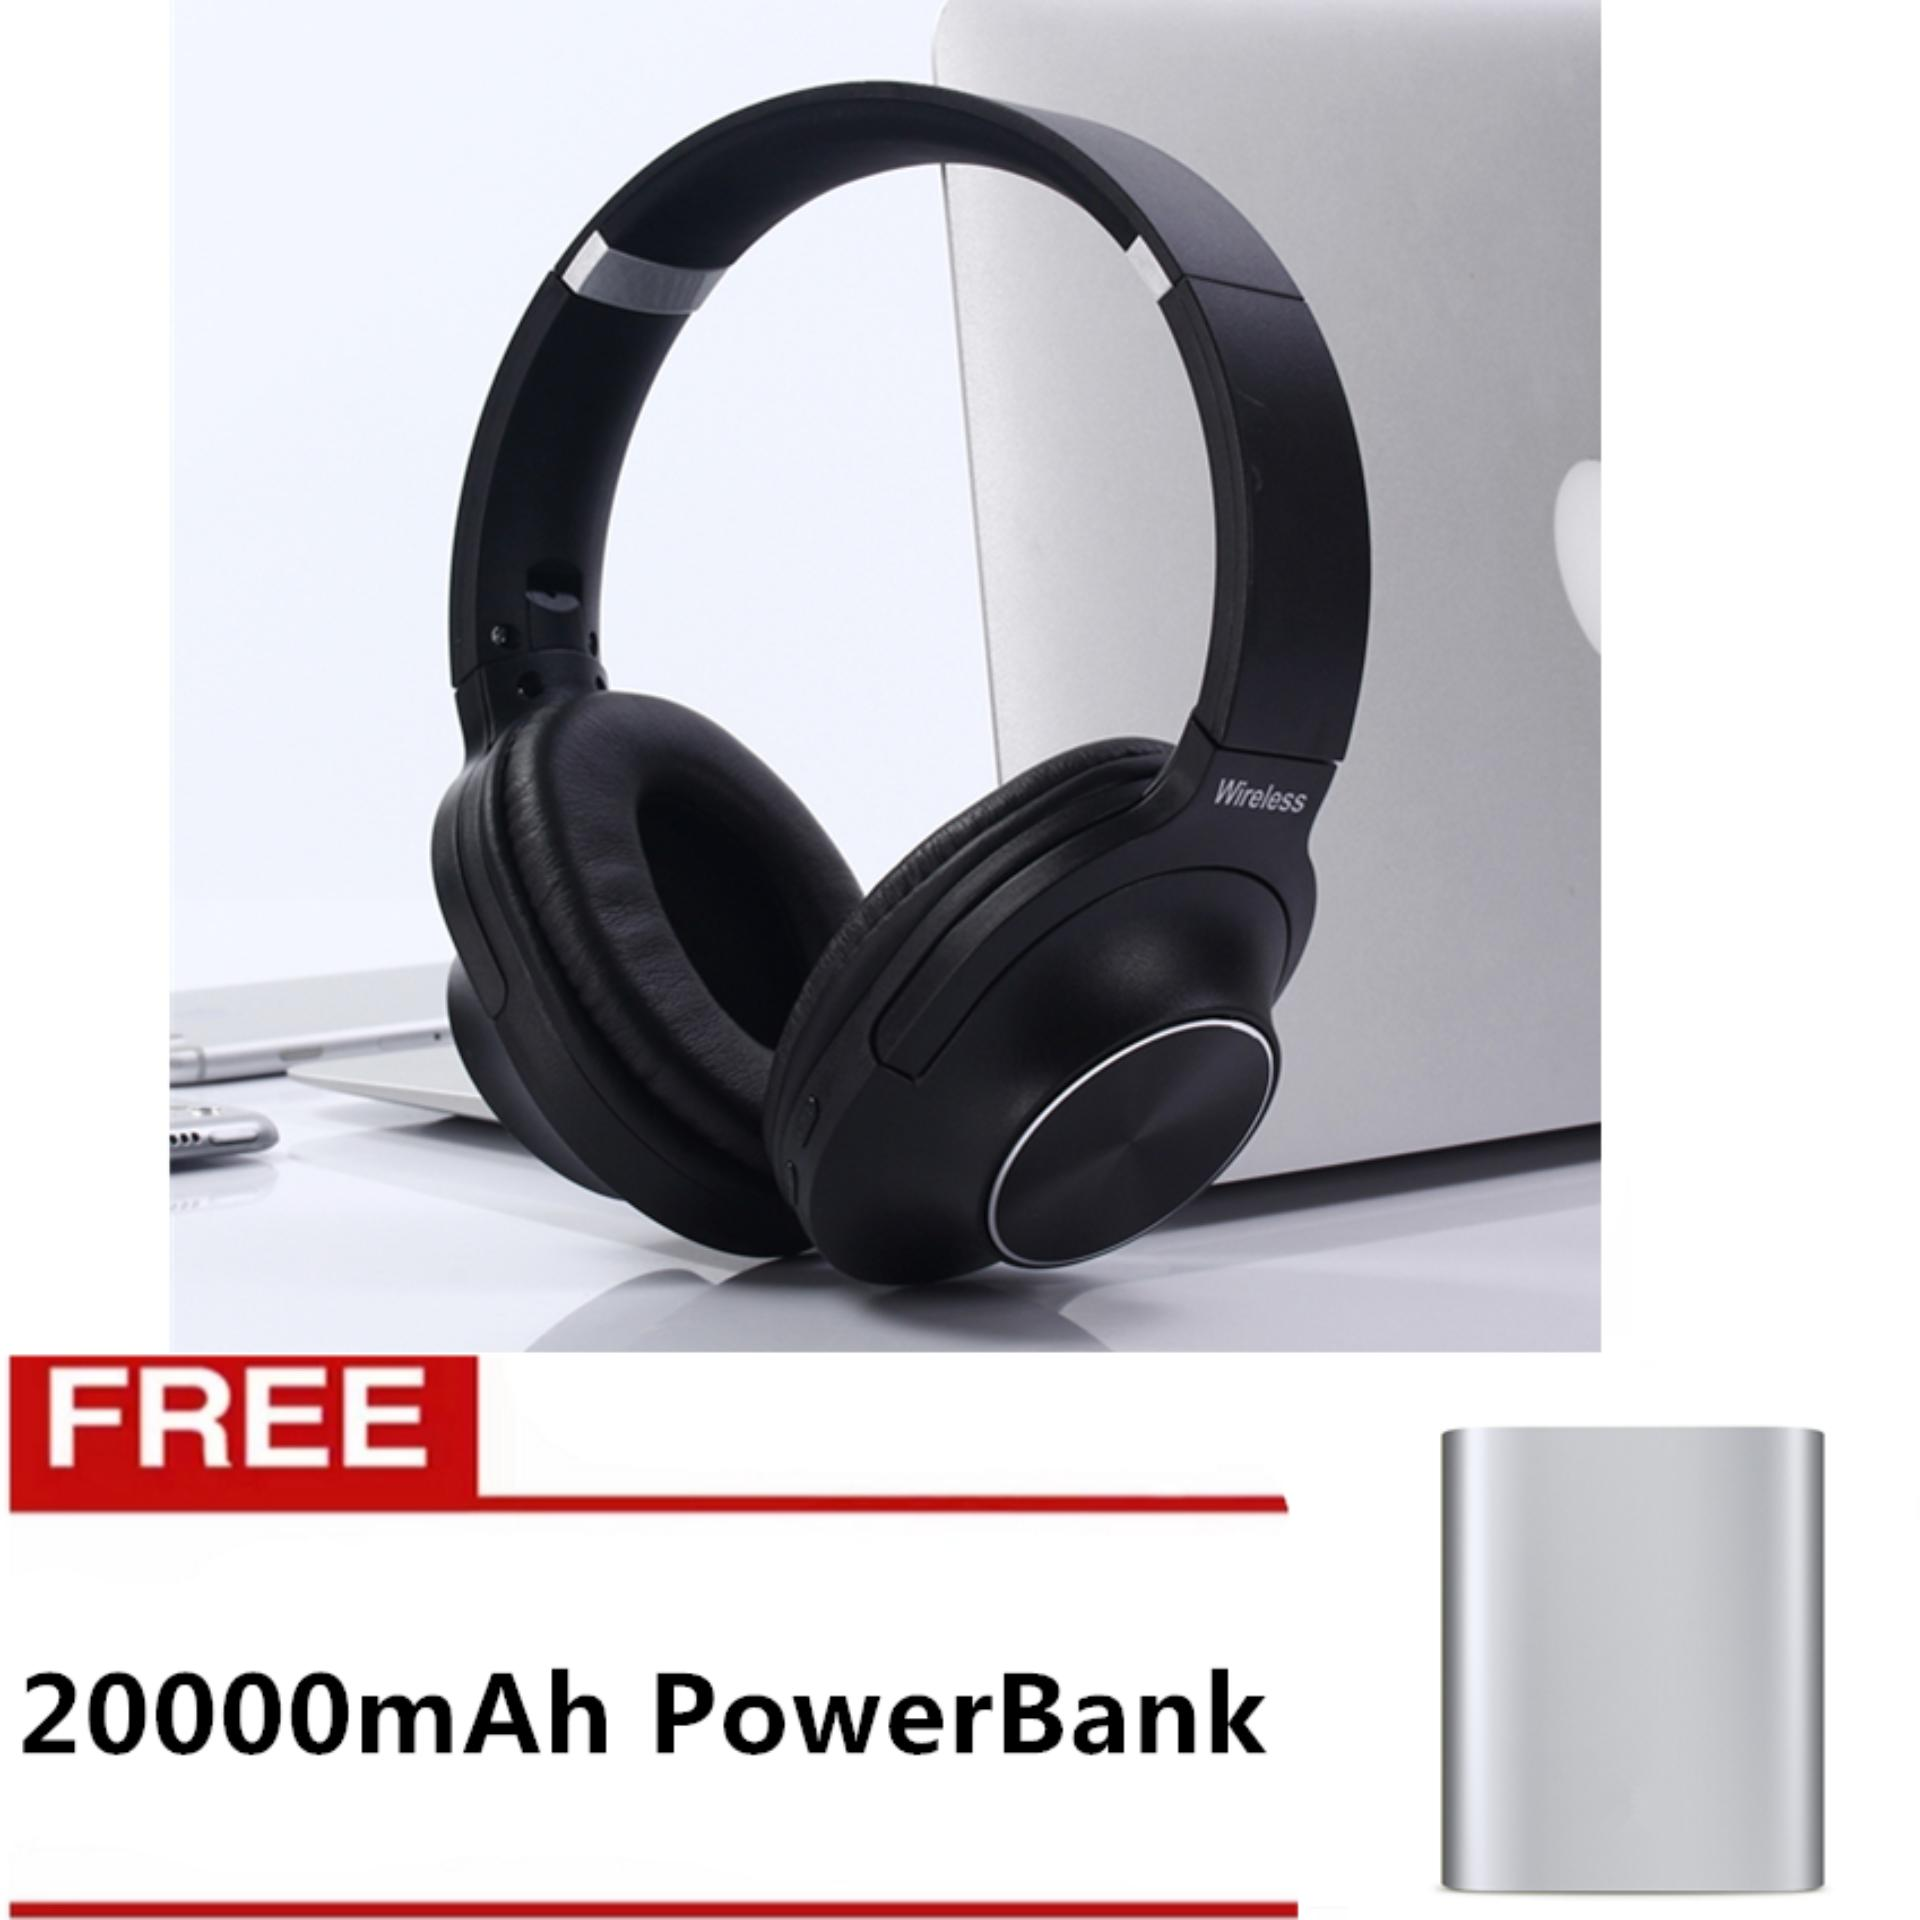 Over The Ear Headphone For Sale Headphones Prices Headset Jbll Ak Bluetooth Jbl Kd21 Black Free 20000 Mah Power Bank